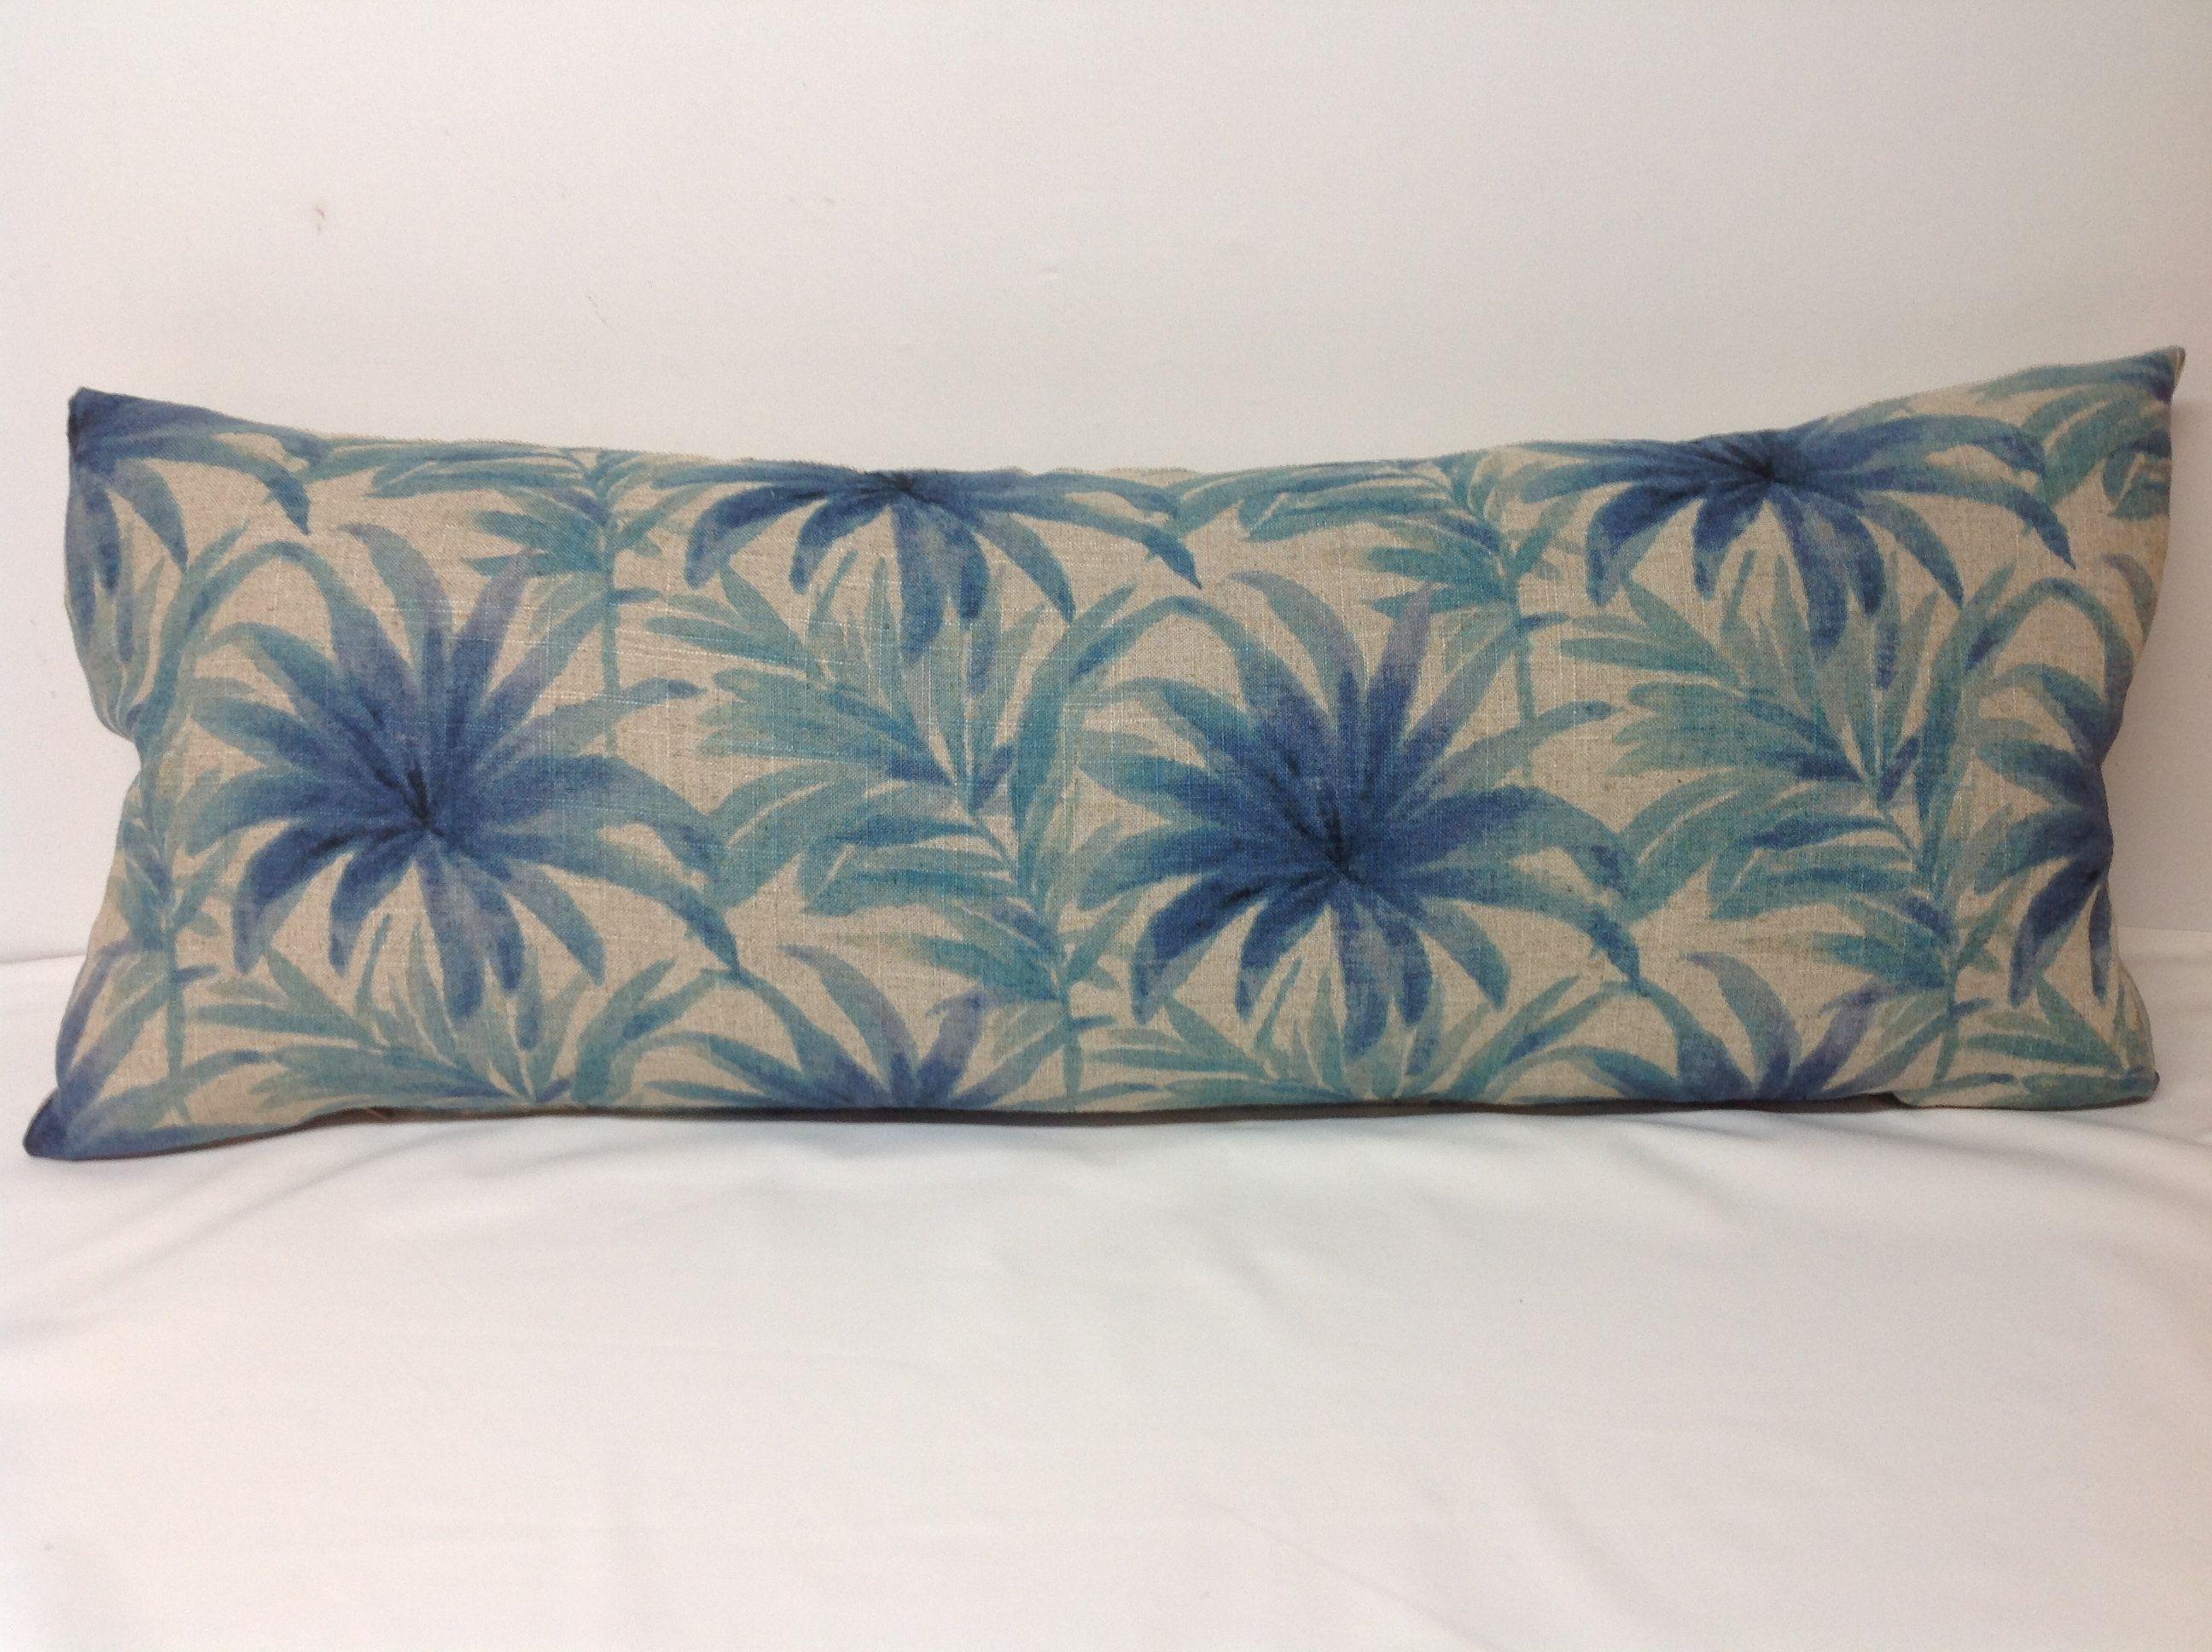 Gray Blue Large Lumbar Pillow Pillow Cover Floral Linen Pillow Decorative Pillow Accent Pillow Pillow Bedding Tommy Baha Pillows Pillow Covers Bed Pillows